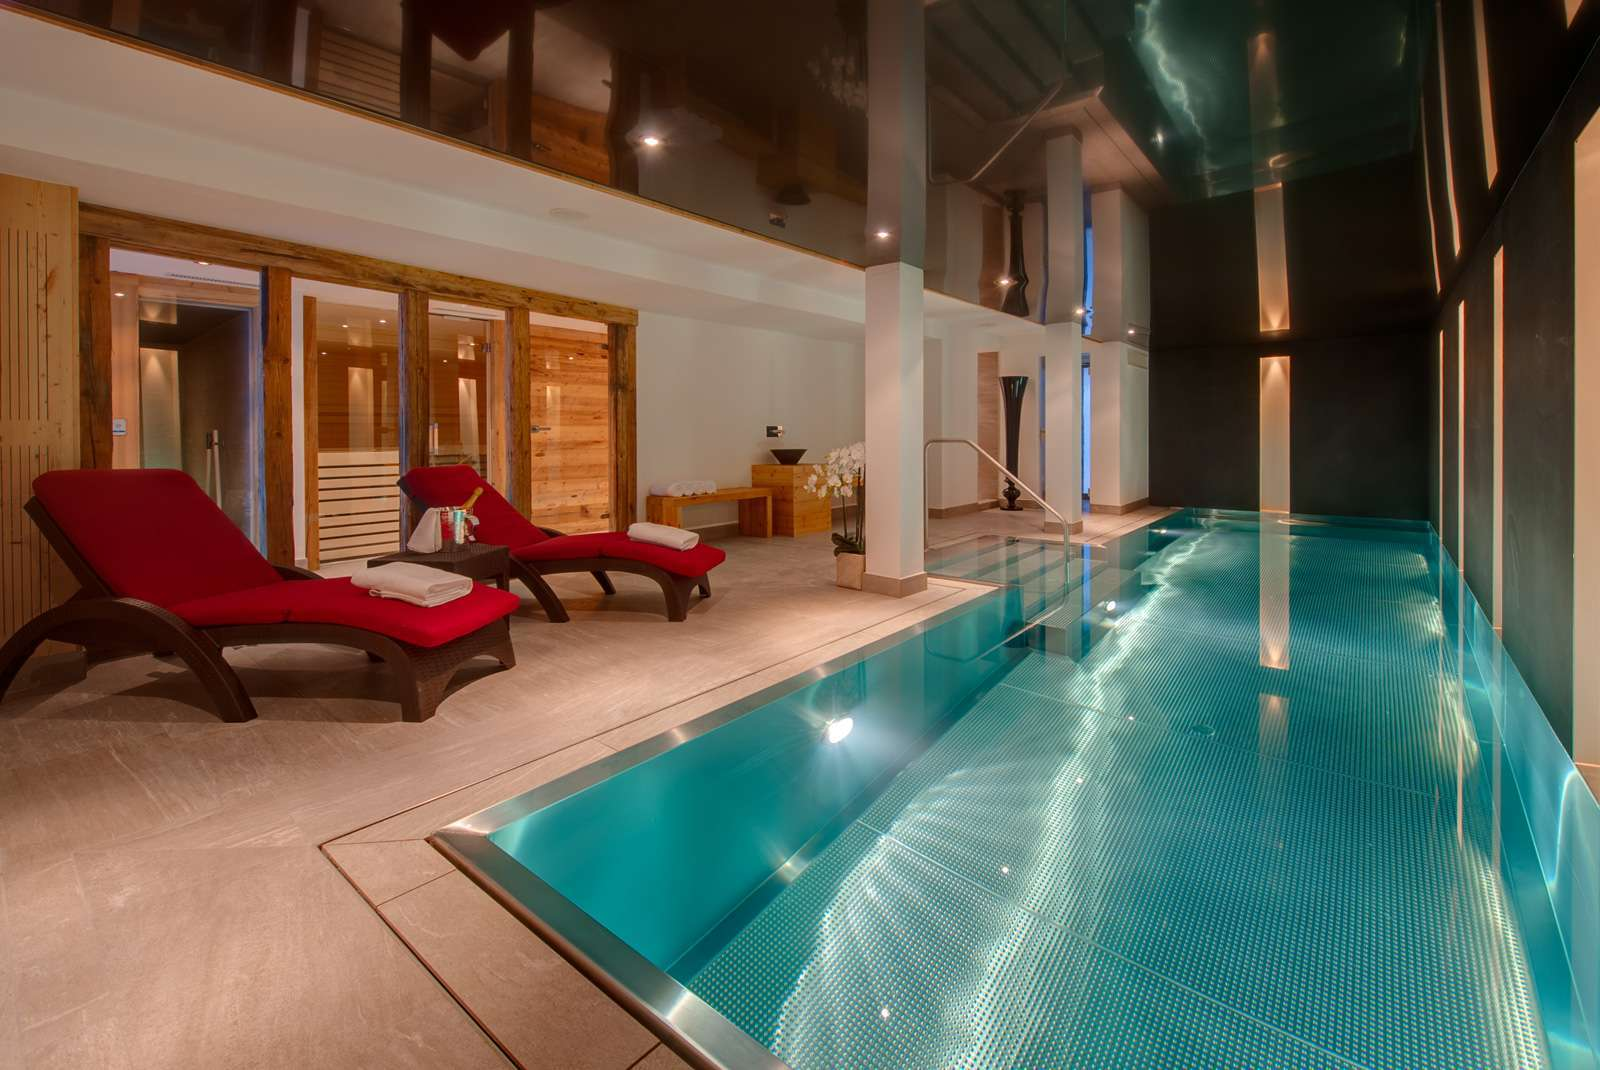 Kings-avenue-zermatt-wifi-sauna-hammam-jacuzzi-swimming-pool-childfriendly-cinema-fireplace-games-room-bar-lift-area-zermatt-005